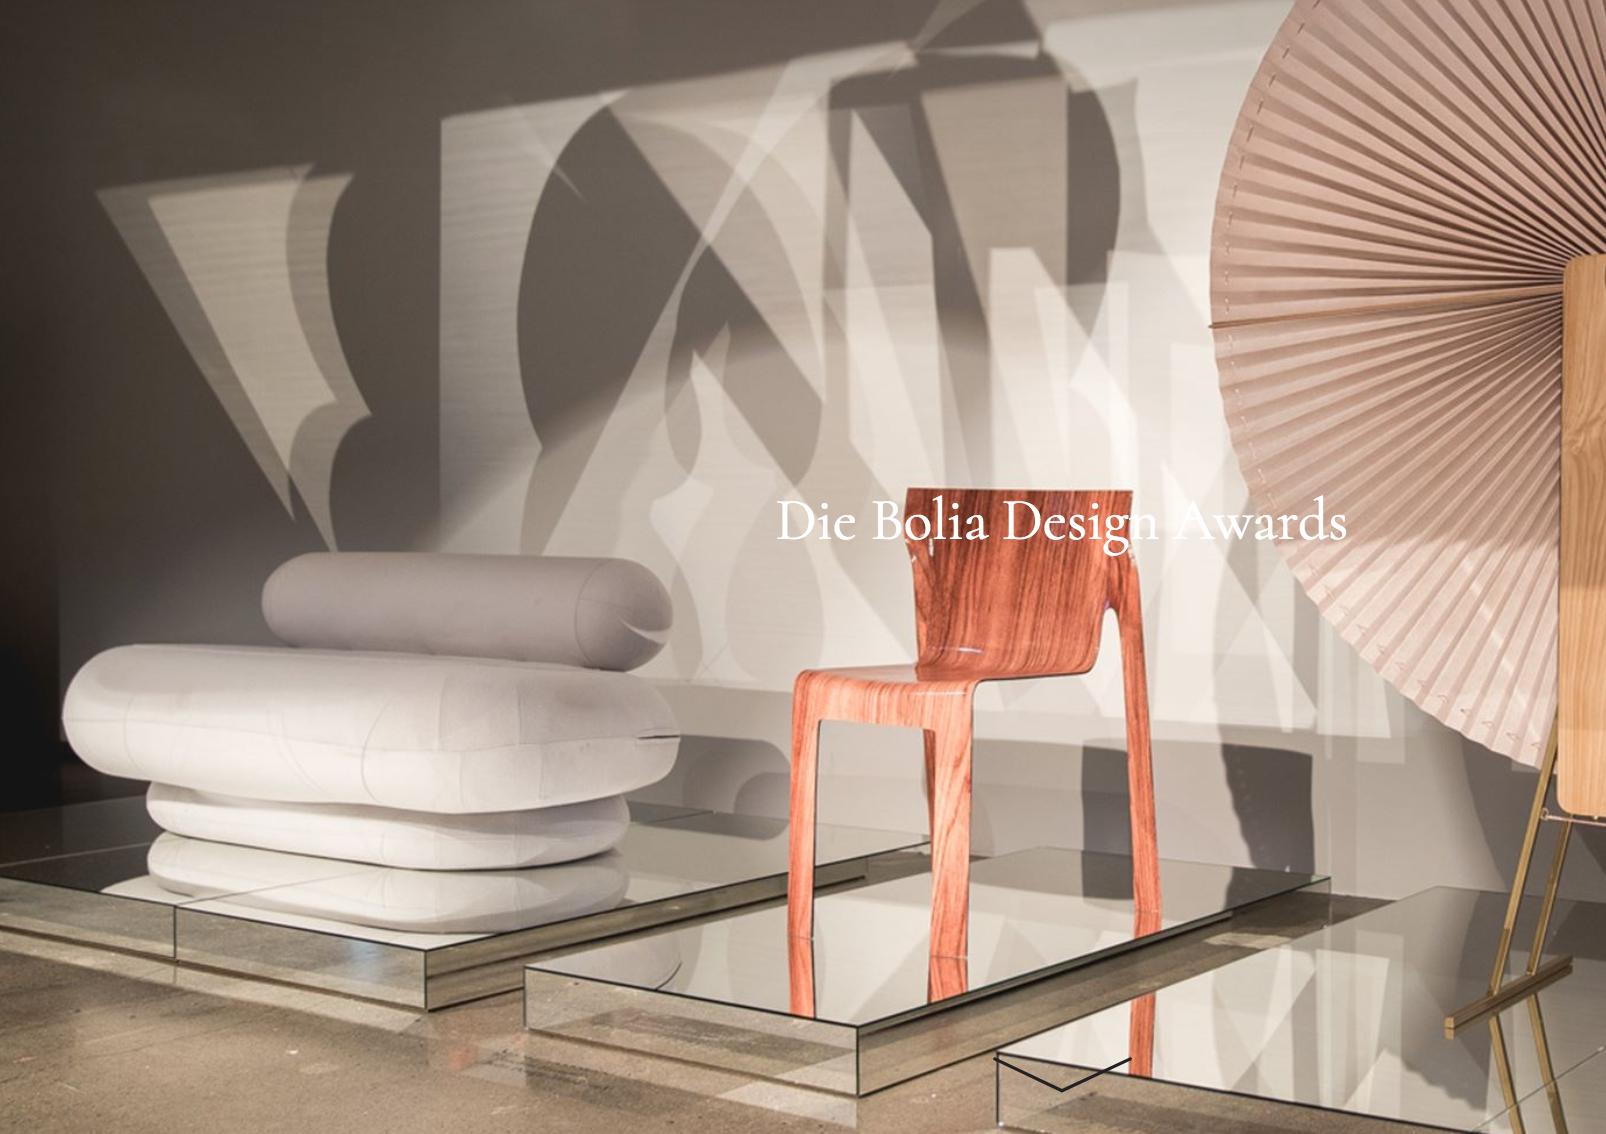 Bolia Design Awards 2021: Bewerbung bis 19. 04. 2021